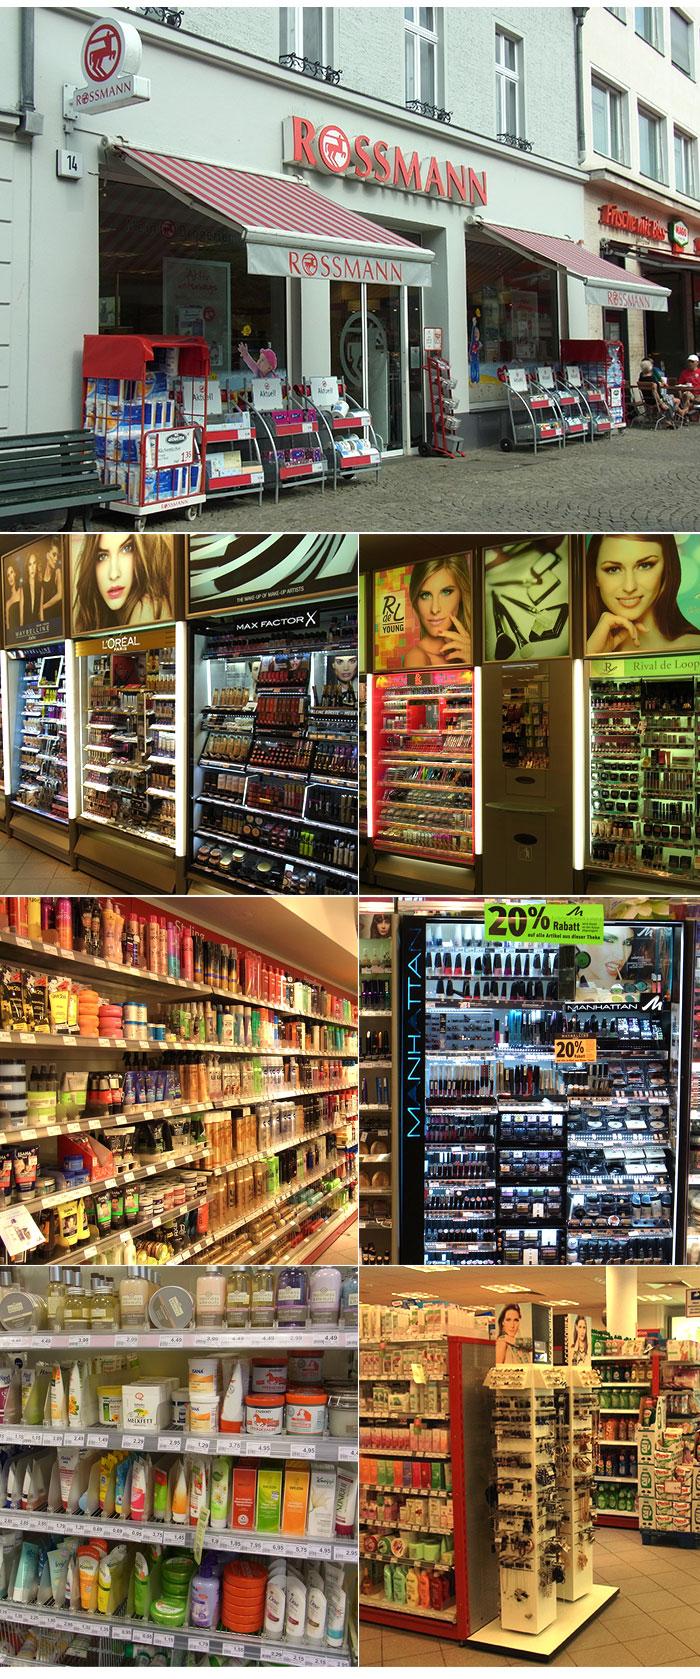 produtos_beleza_alemanha_rossmann